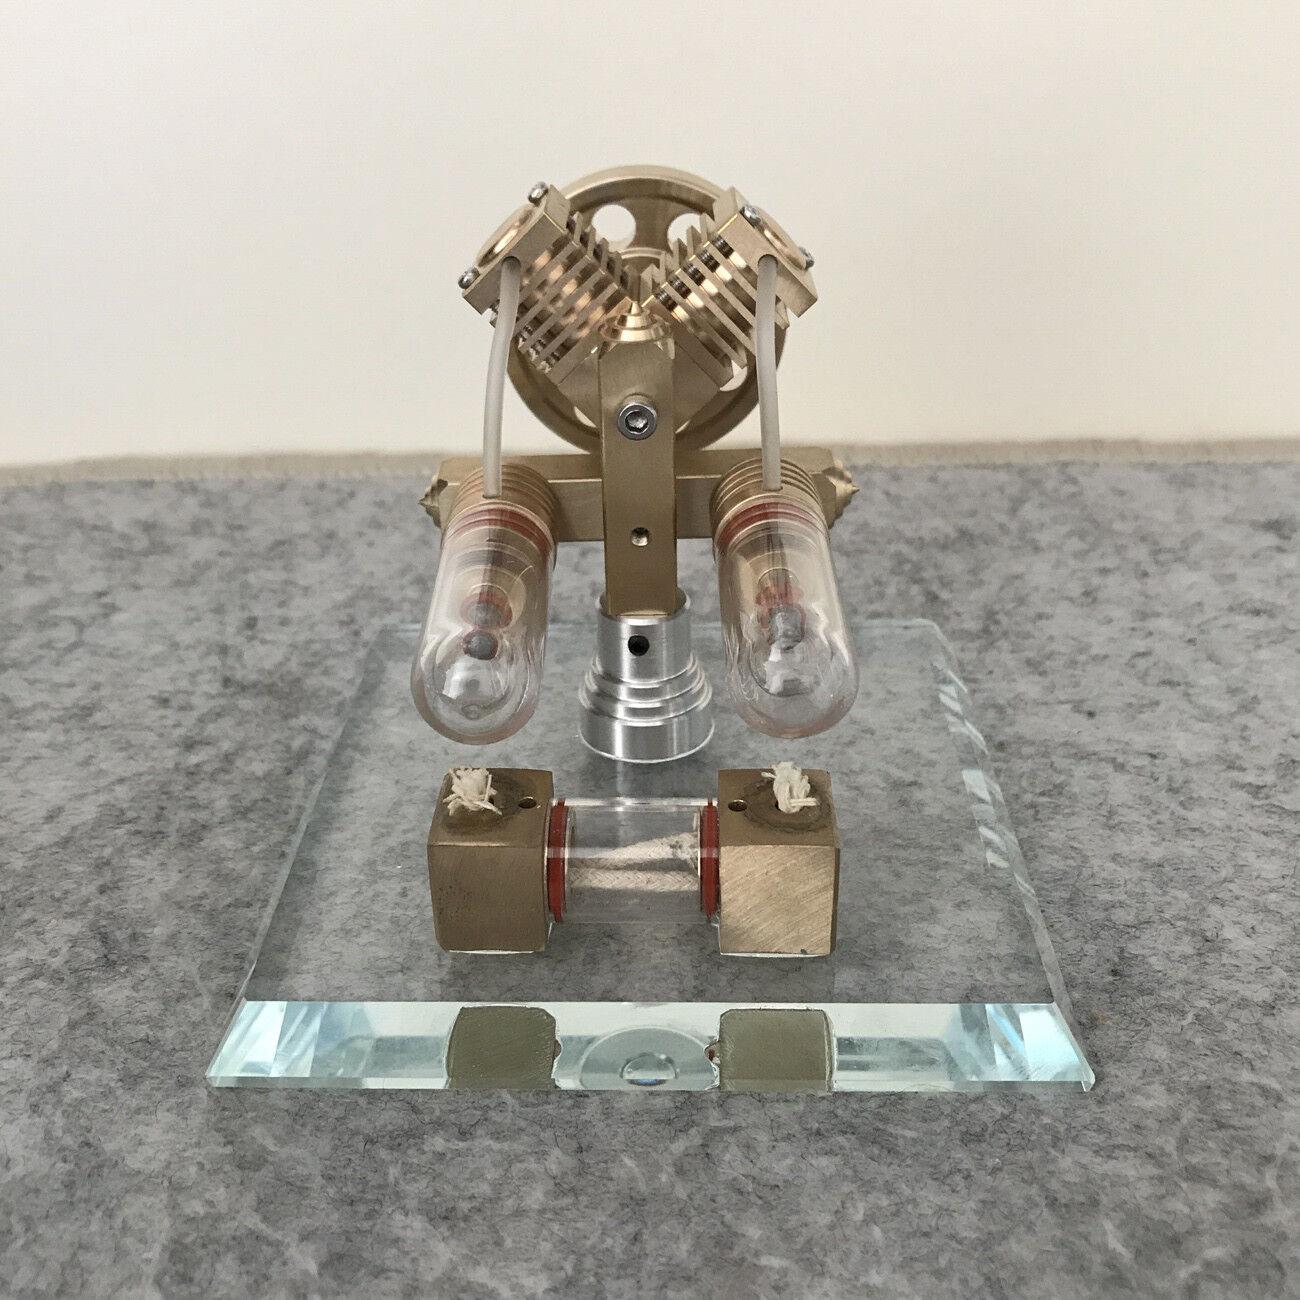 2-Cylinder DIY Stirling Engine Model Toy Mini Hot Air Engine Generator Motor Toy